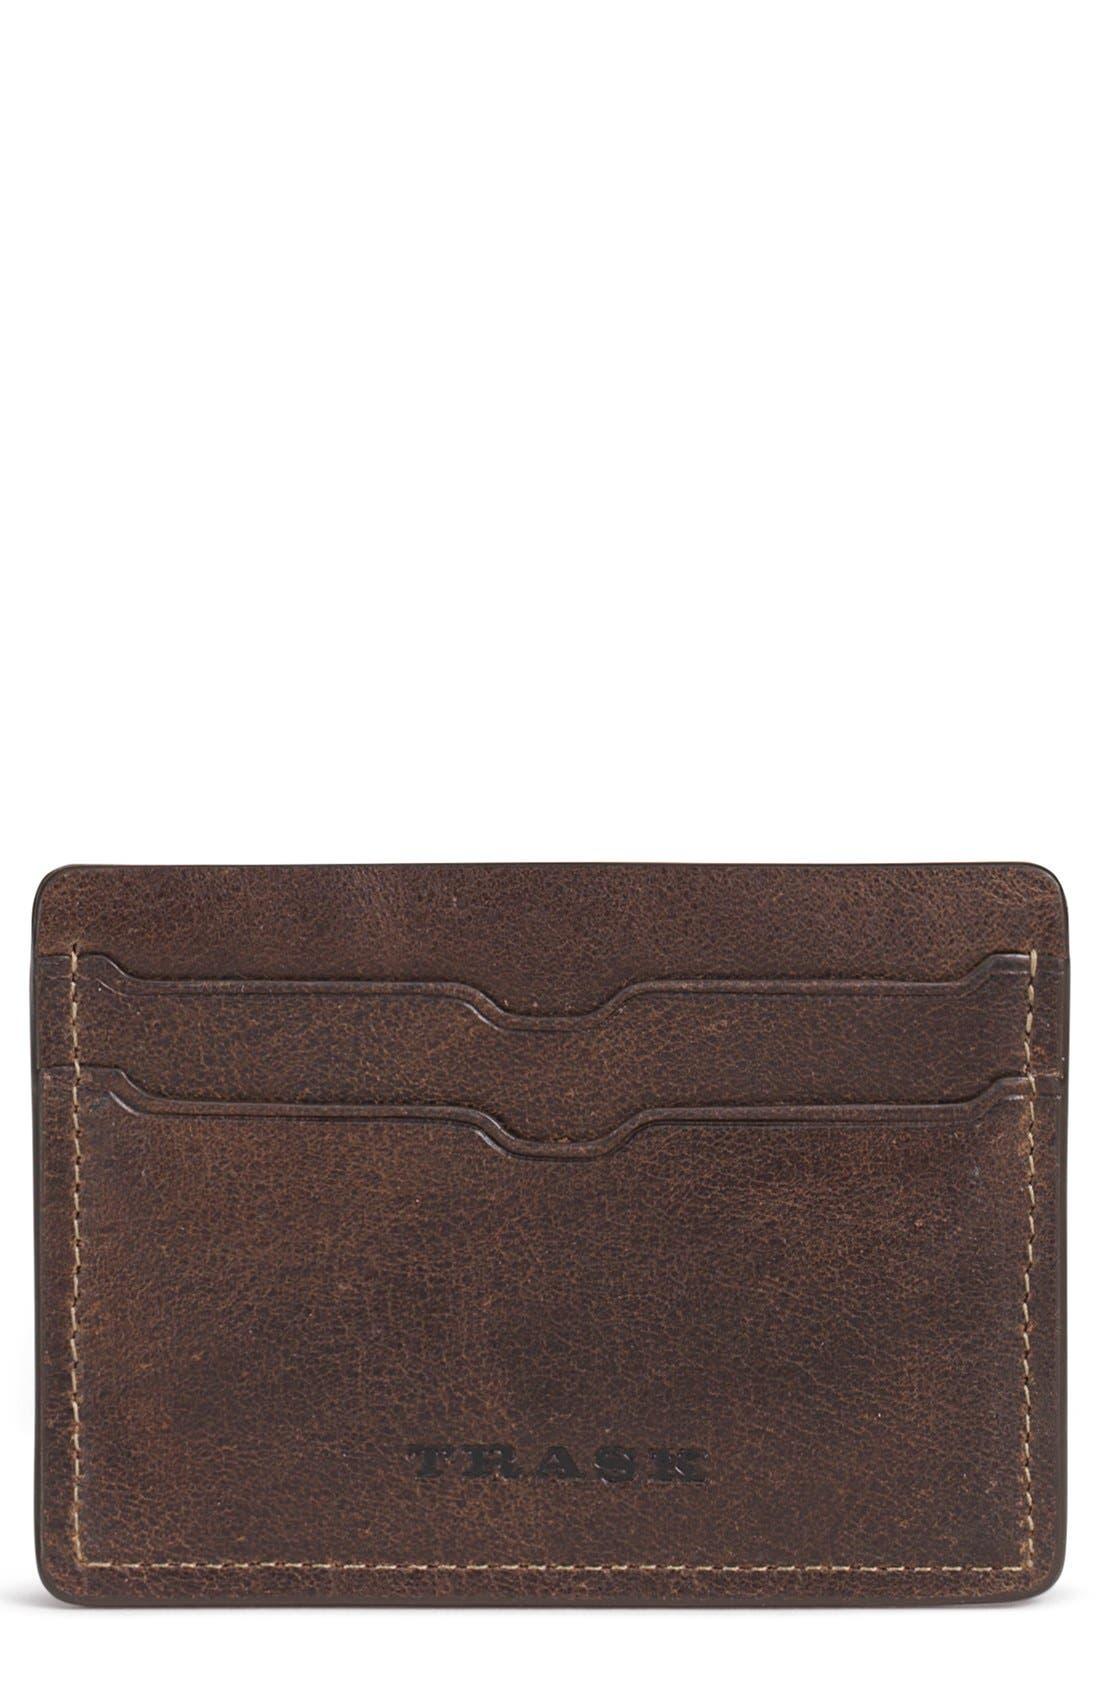 Alternate Image 1 Selected - Trask 'Jackson' Bison Leather Card Case